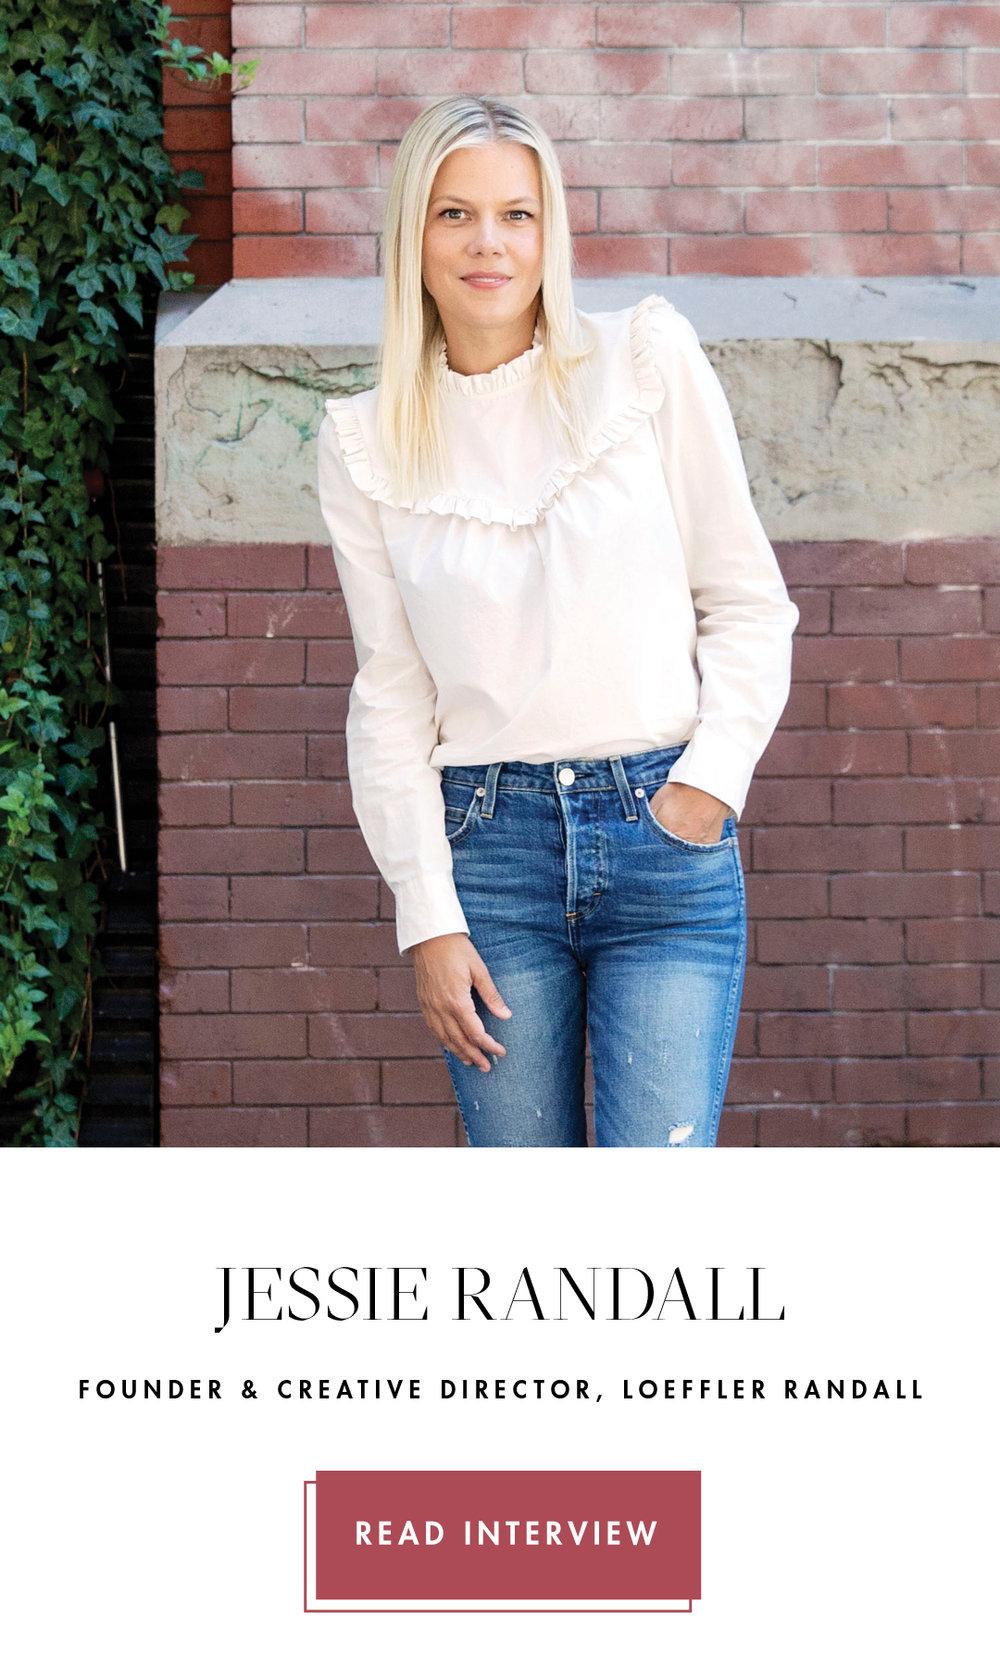 jessie-randall.jpg